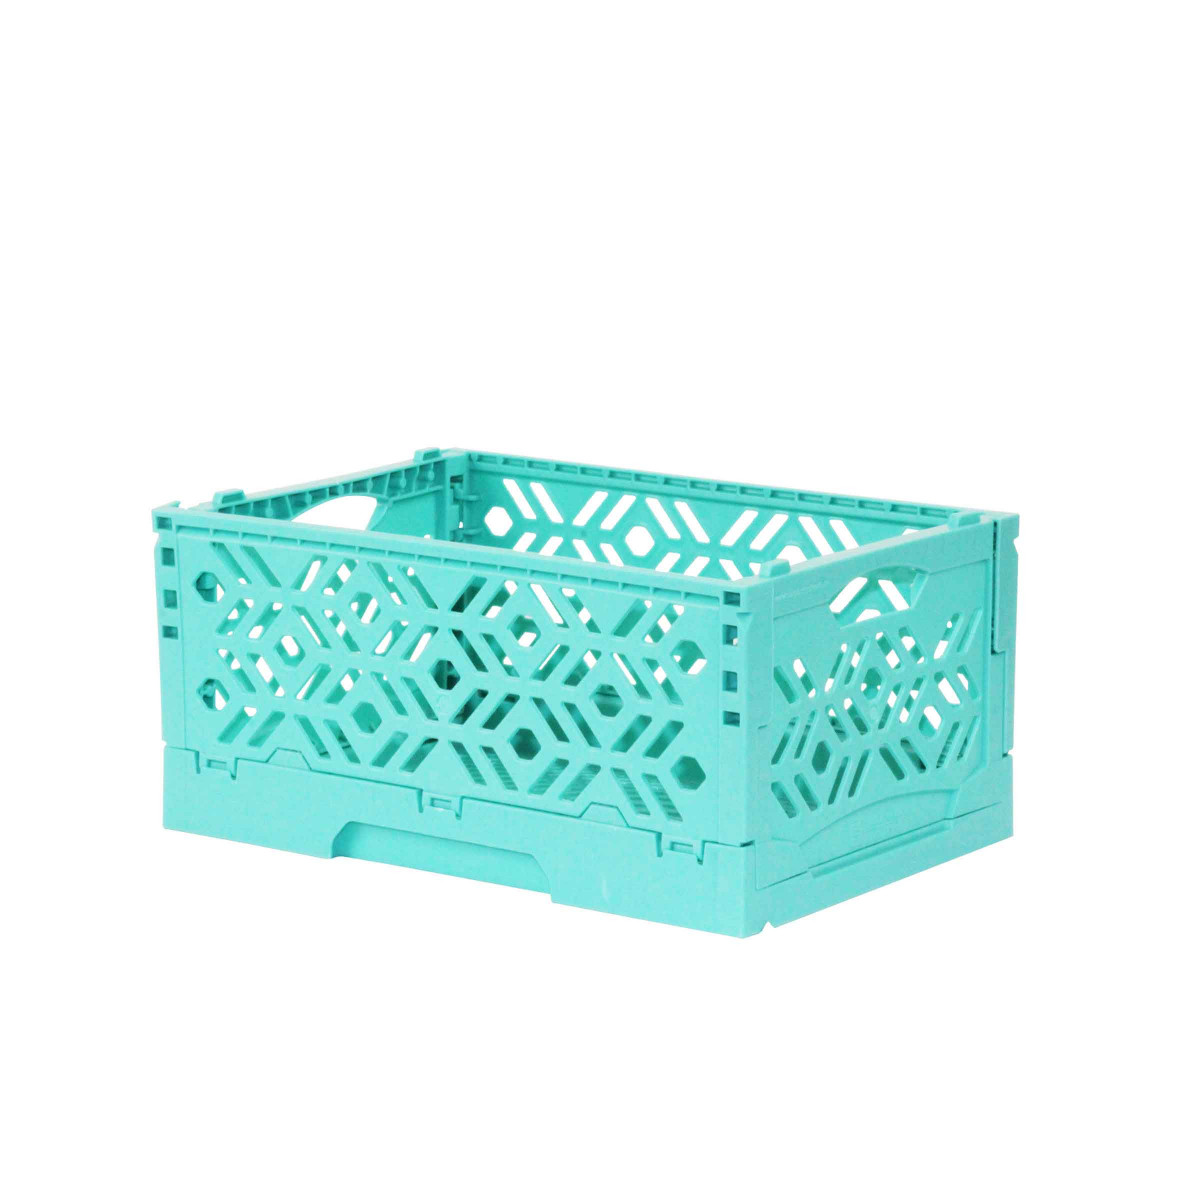 mini cagette turquoise empilable et pliable. Black Bedroom Furniture Sets. Home Design Ideas